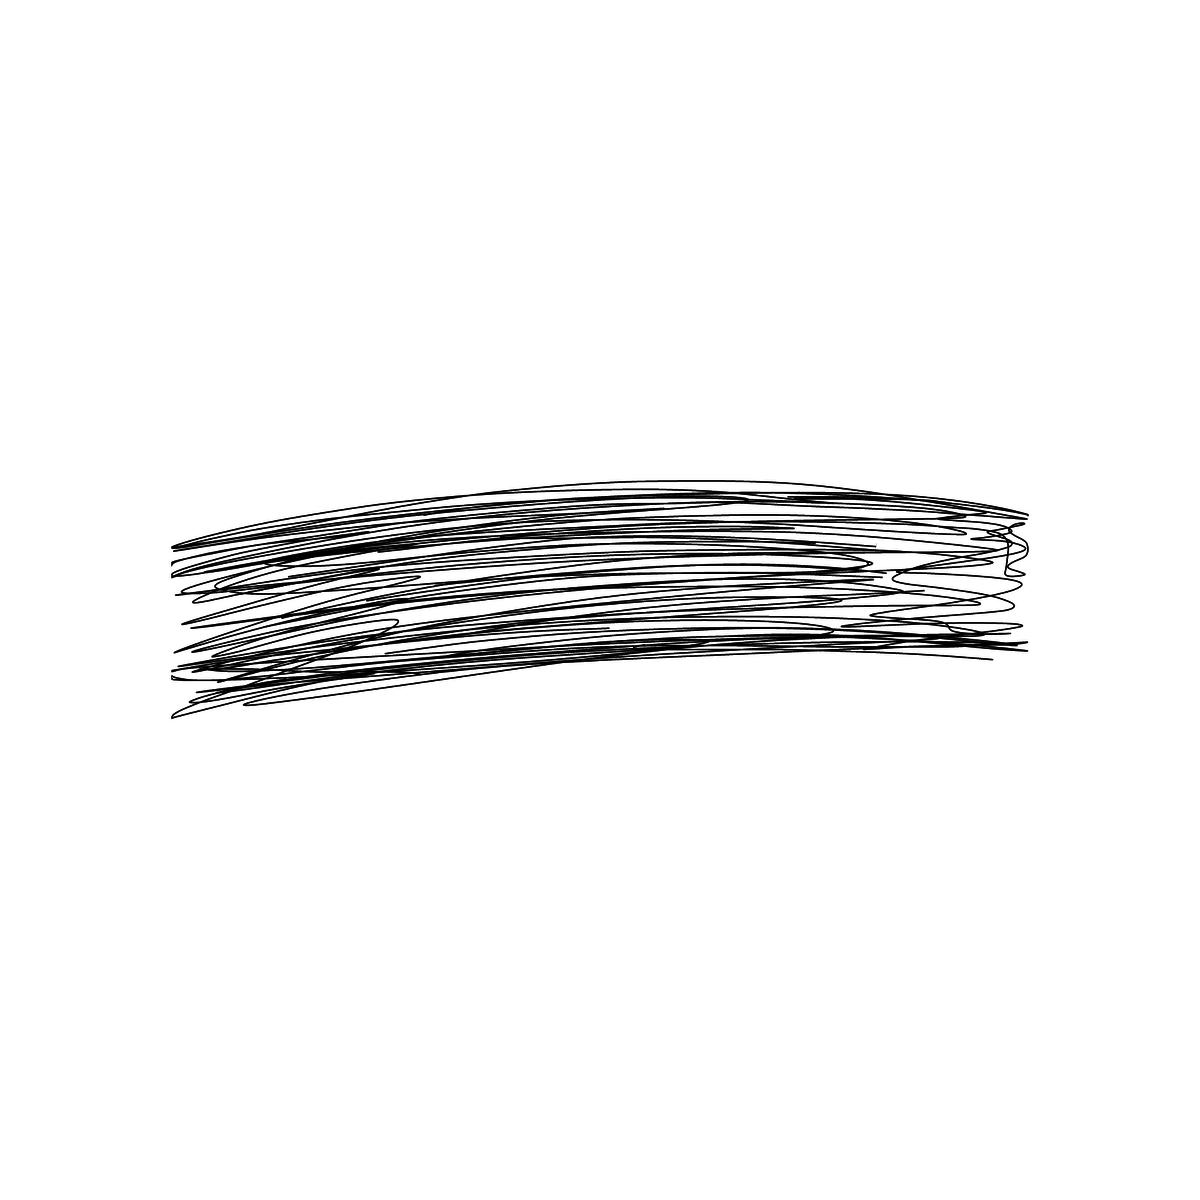 BAAAM drawing#9004 lat:60.4561996459960940lng: 22.2538833618164060